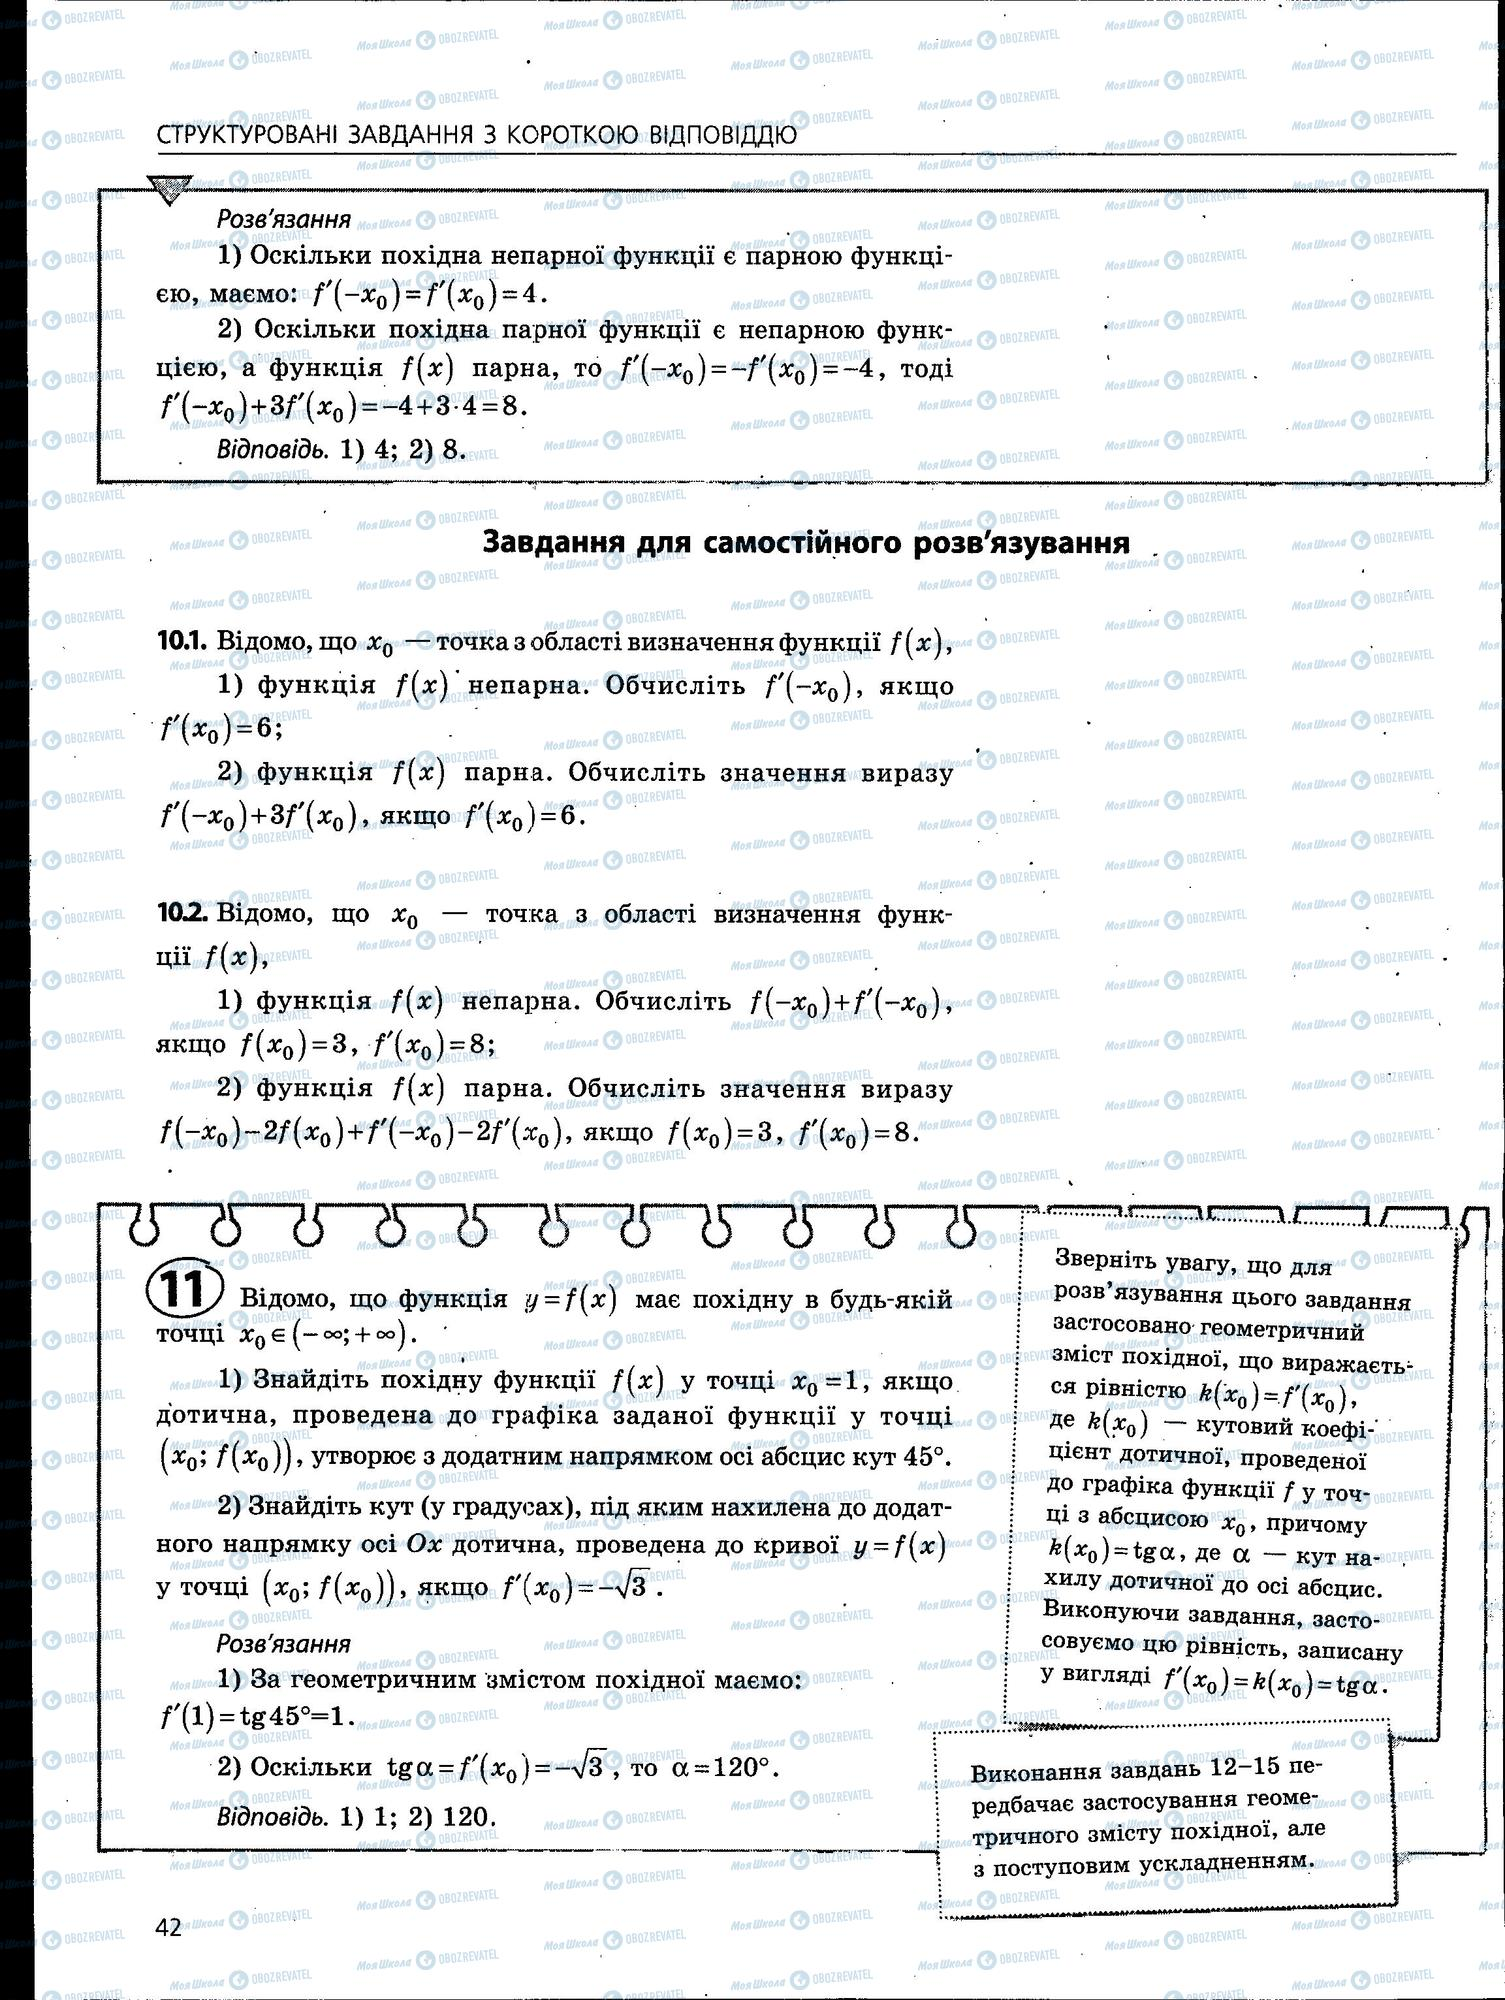 ЗНО Математика 11 класс страница 42